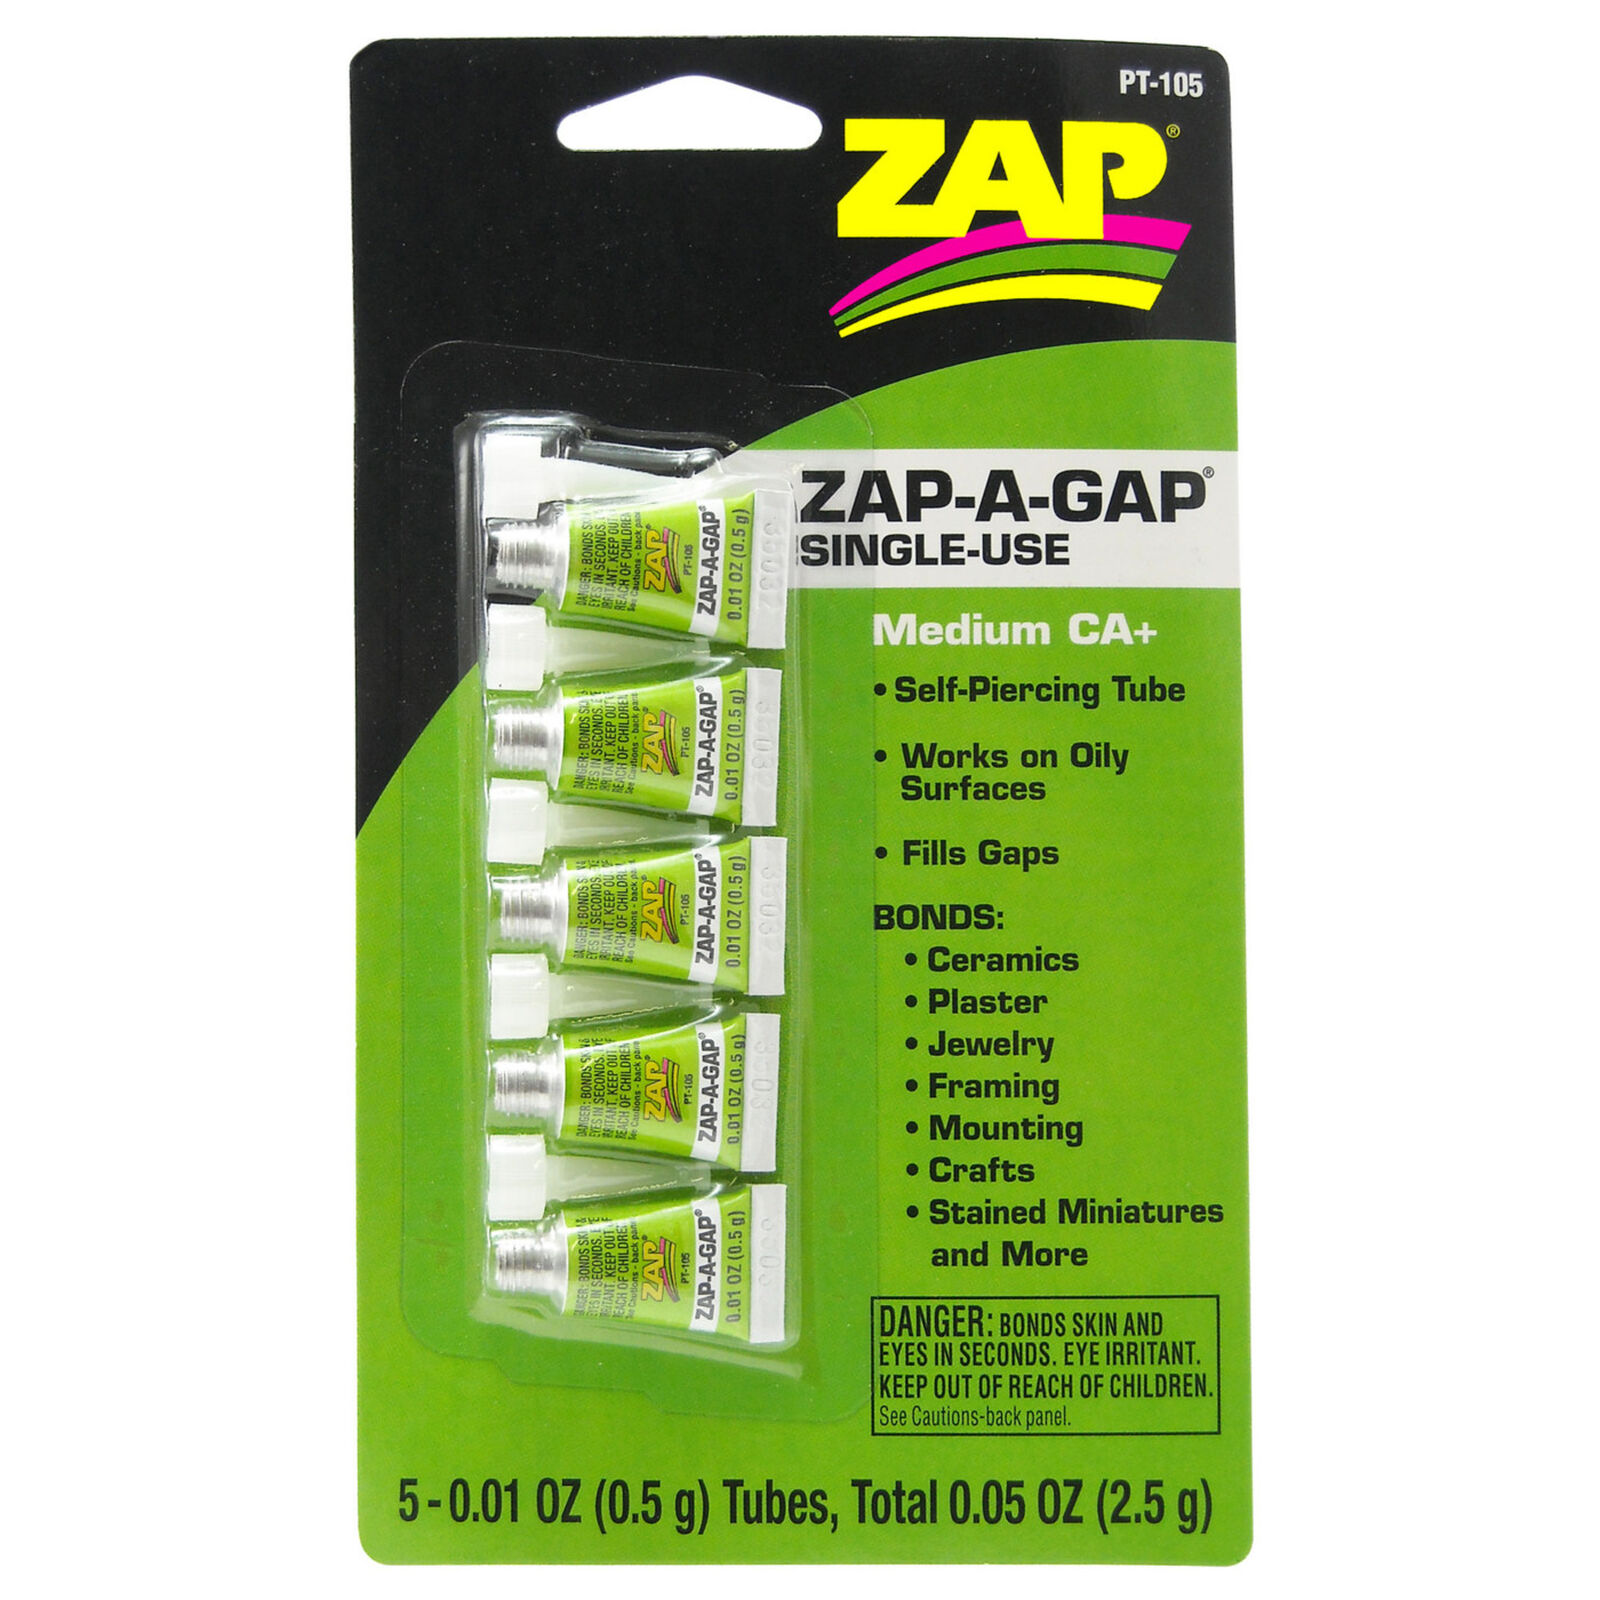 Zap-A-Gap Medium CA+ Single Use Tubes, 5 x 1/2 gram, Carded